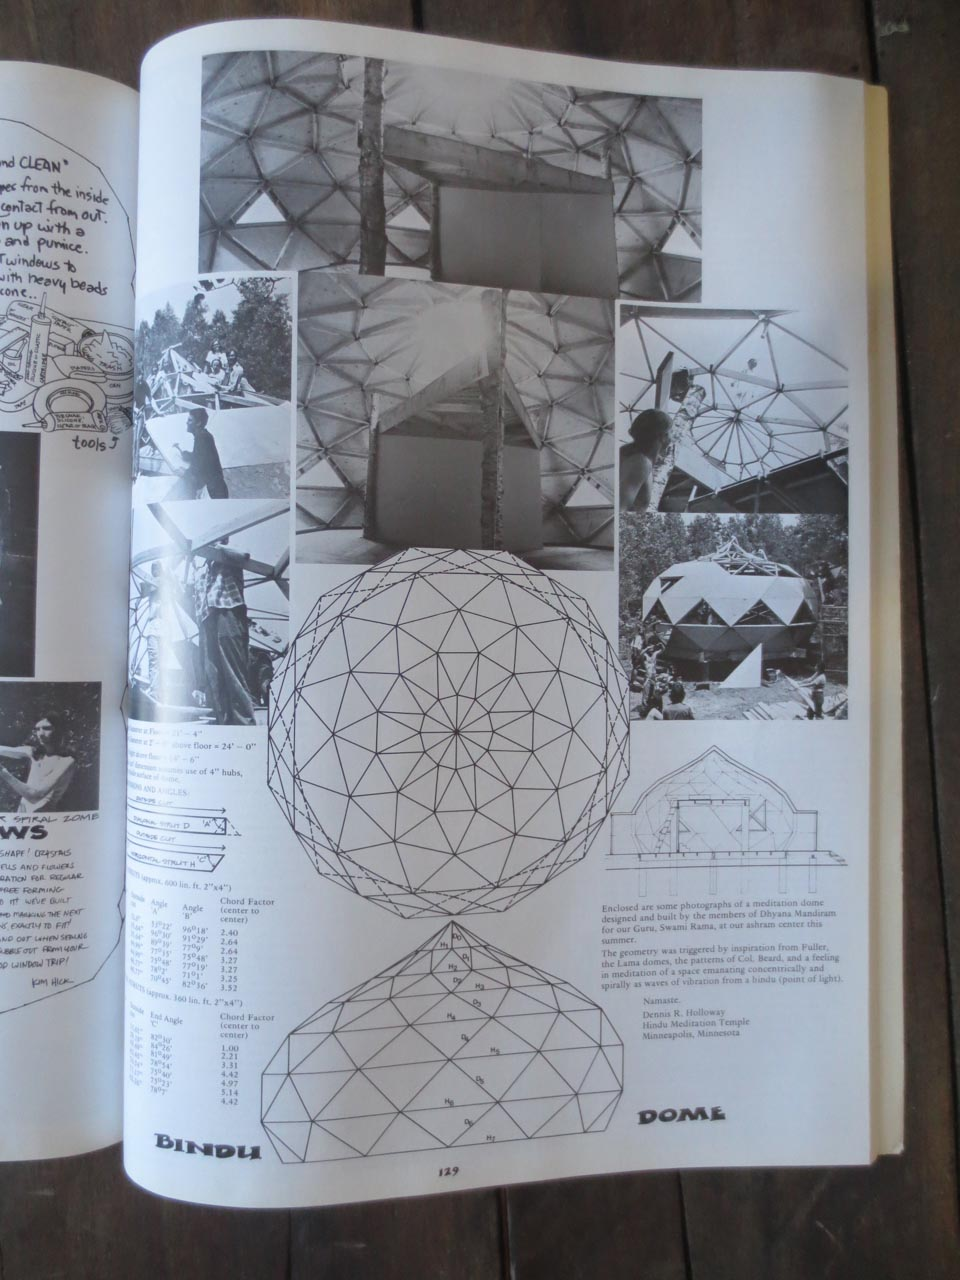 RW_House book-3096.jpg